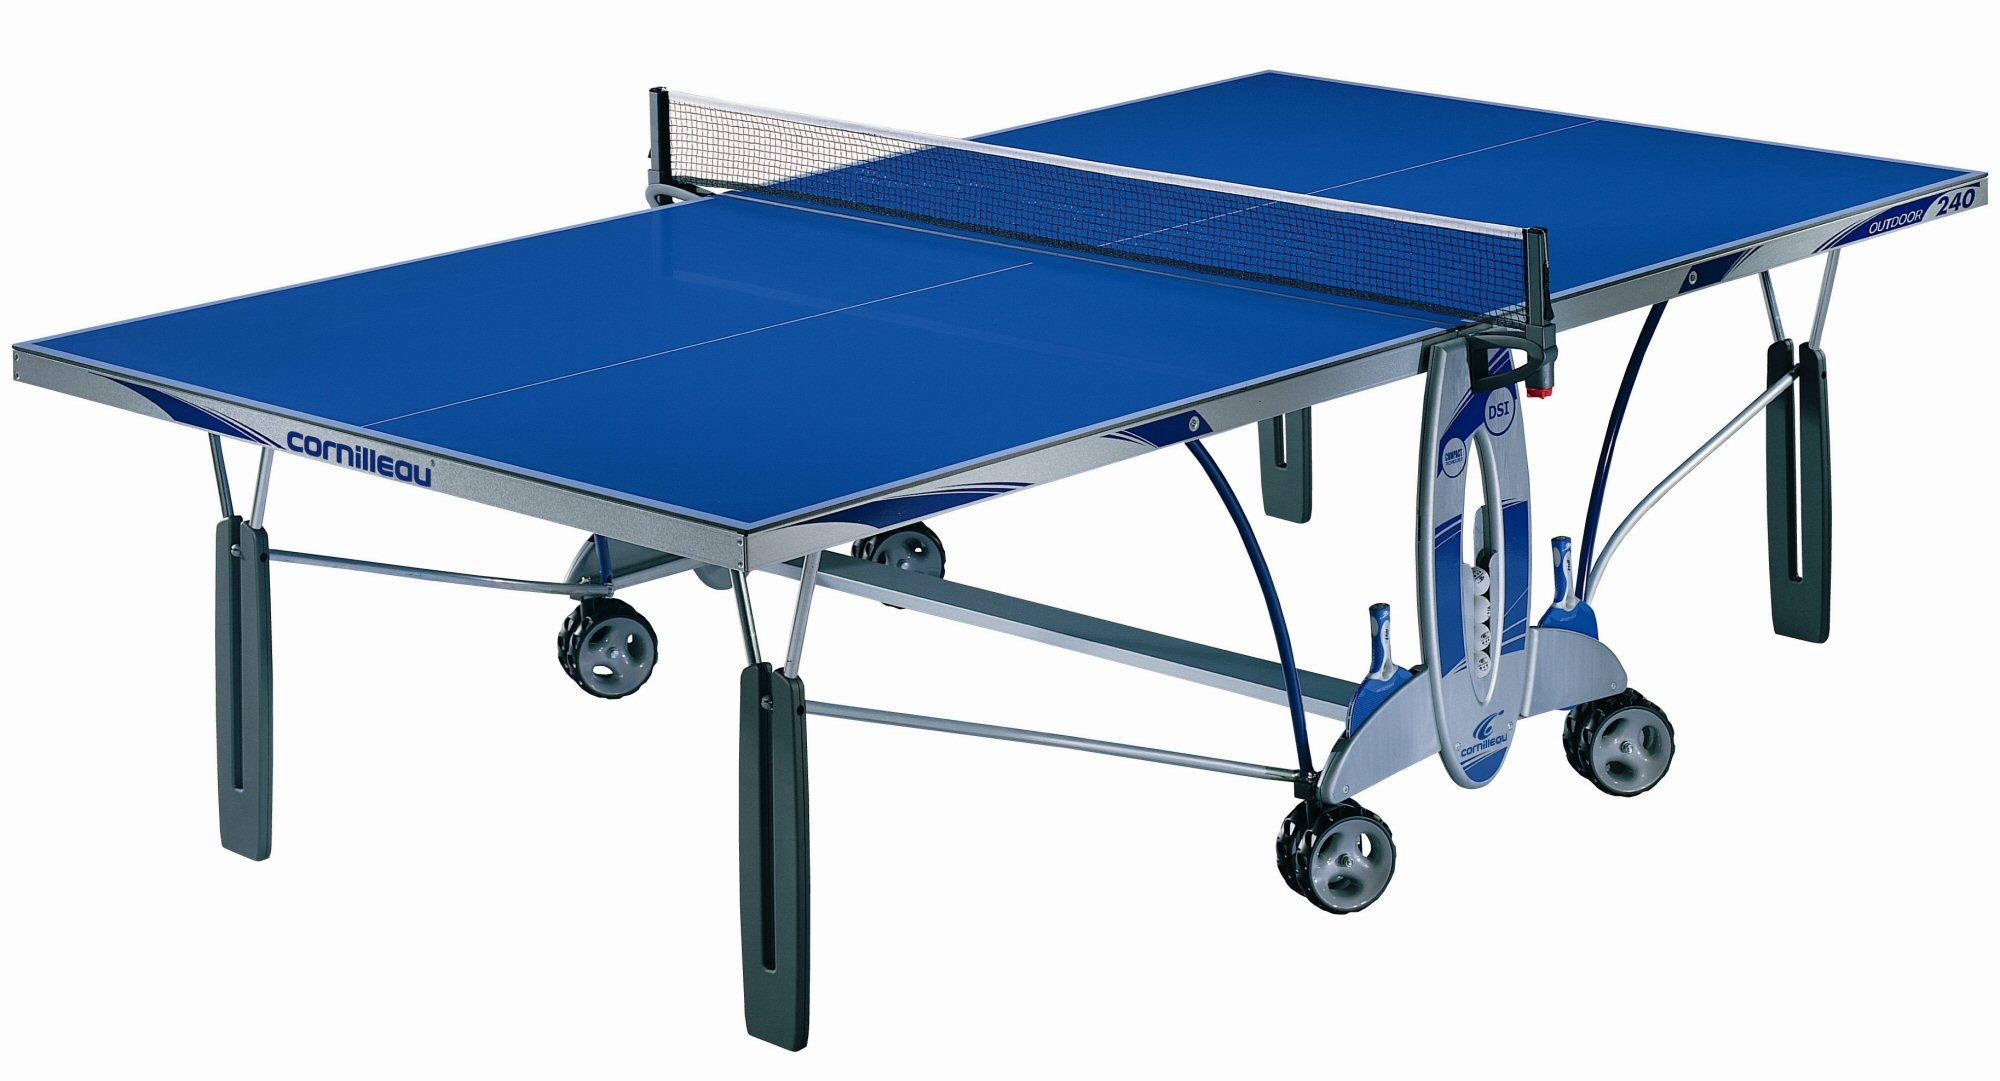 Cornilleau sport 300m outdoor rollaway in blue - Cornilleau outdoor table tennis cover ...